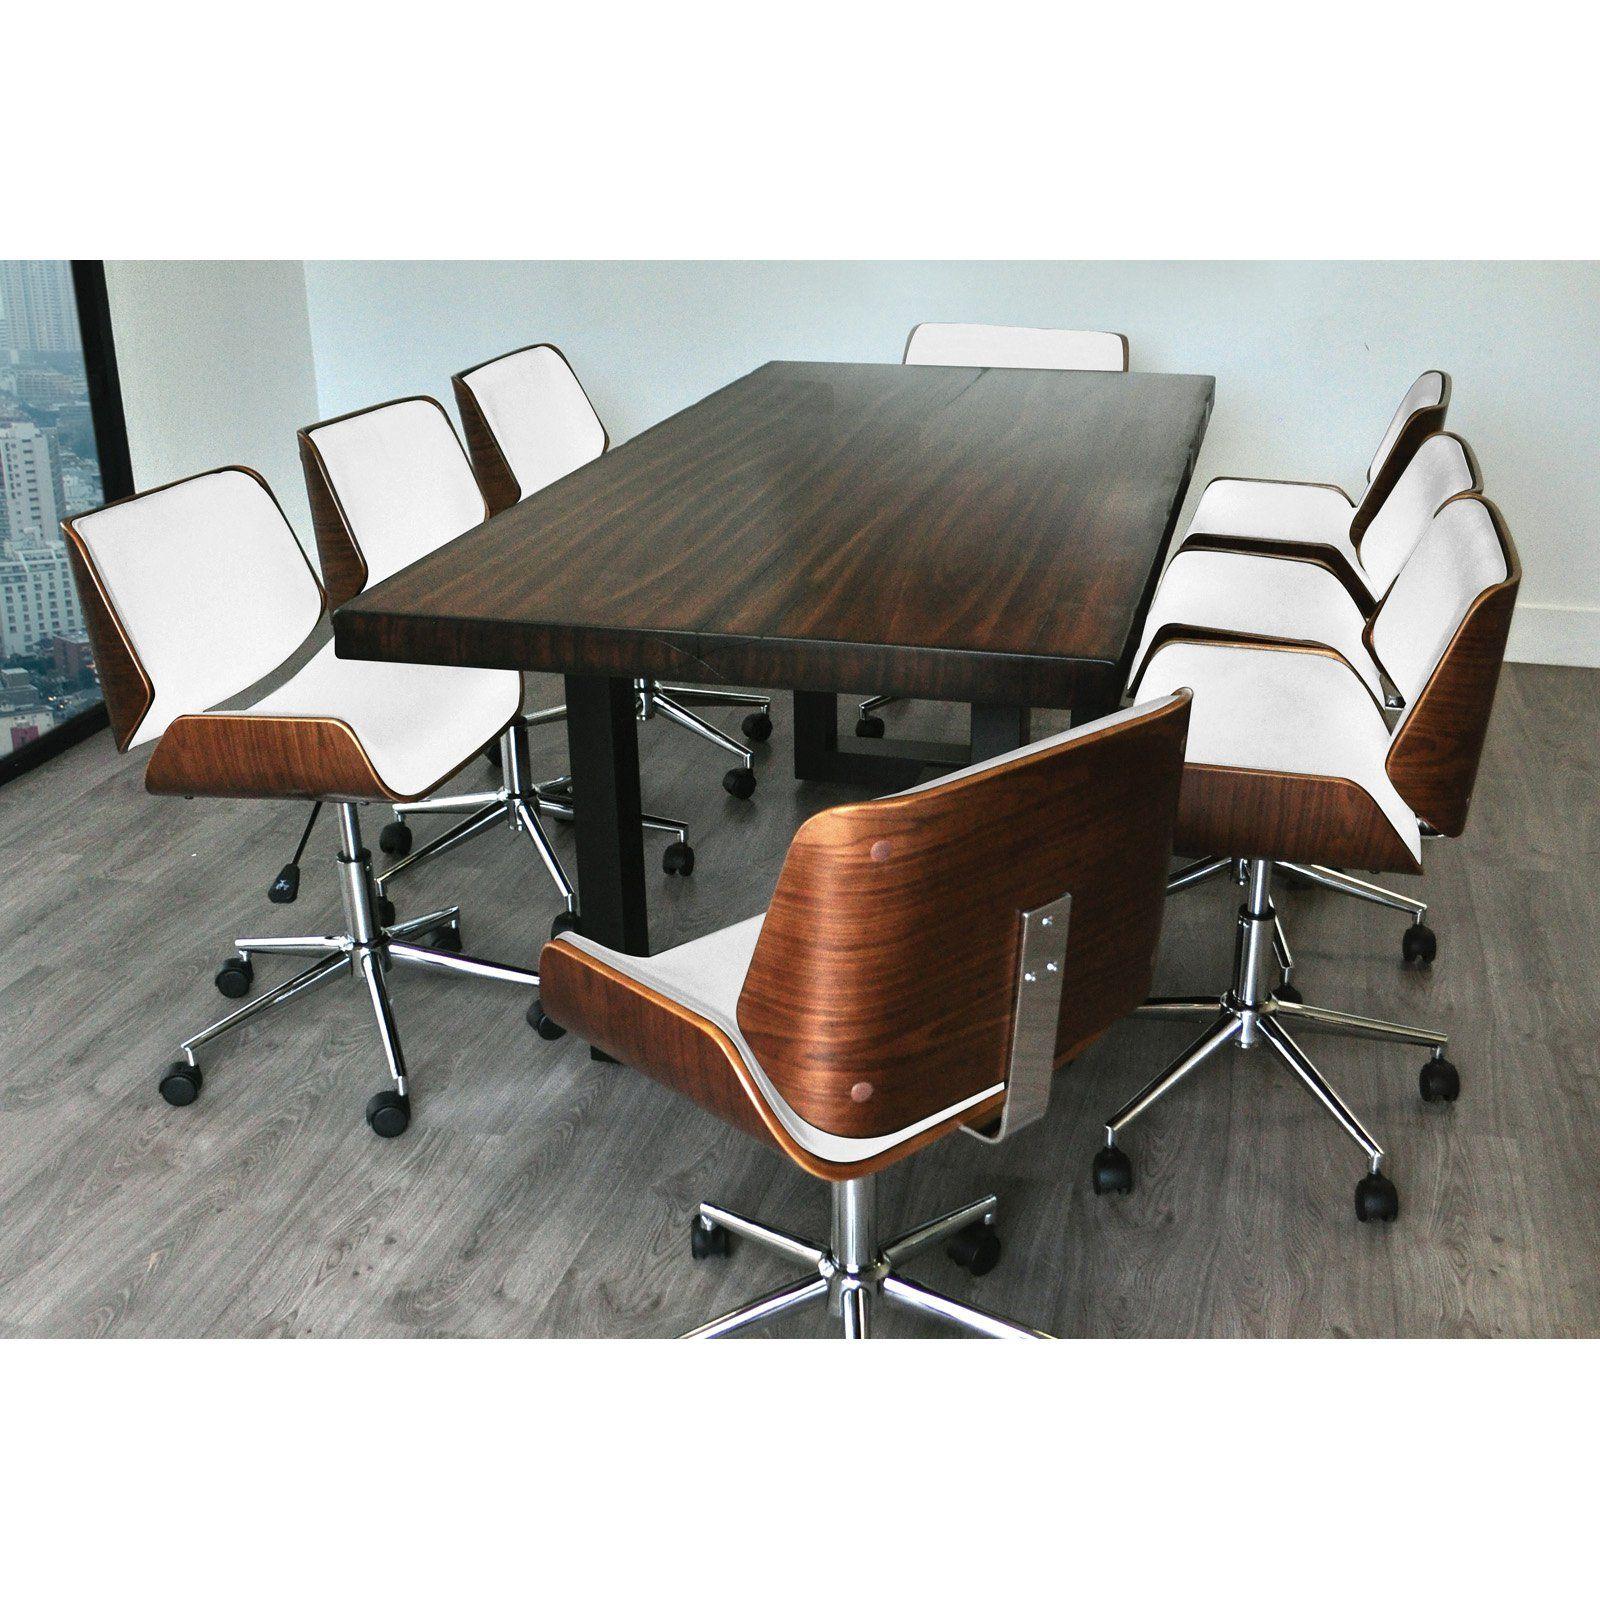 Tremendous Solis Rebus 9 Piece Conference Table Set Brown White Dailytribune Chair Design For Home Dailytribuneorg